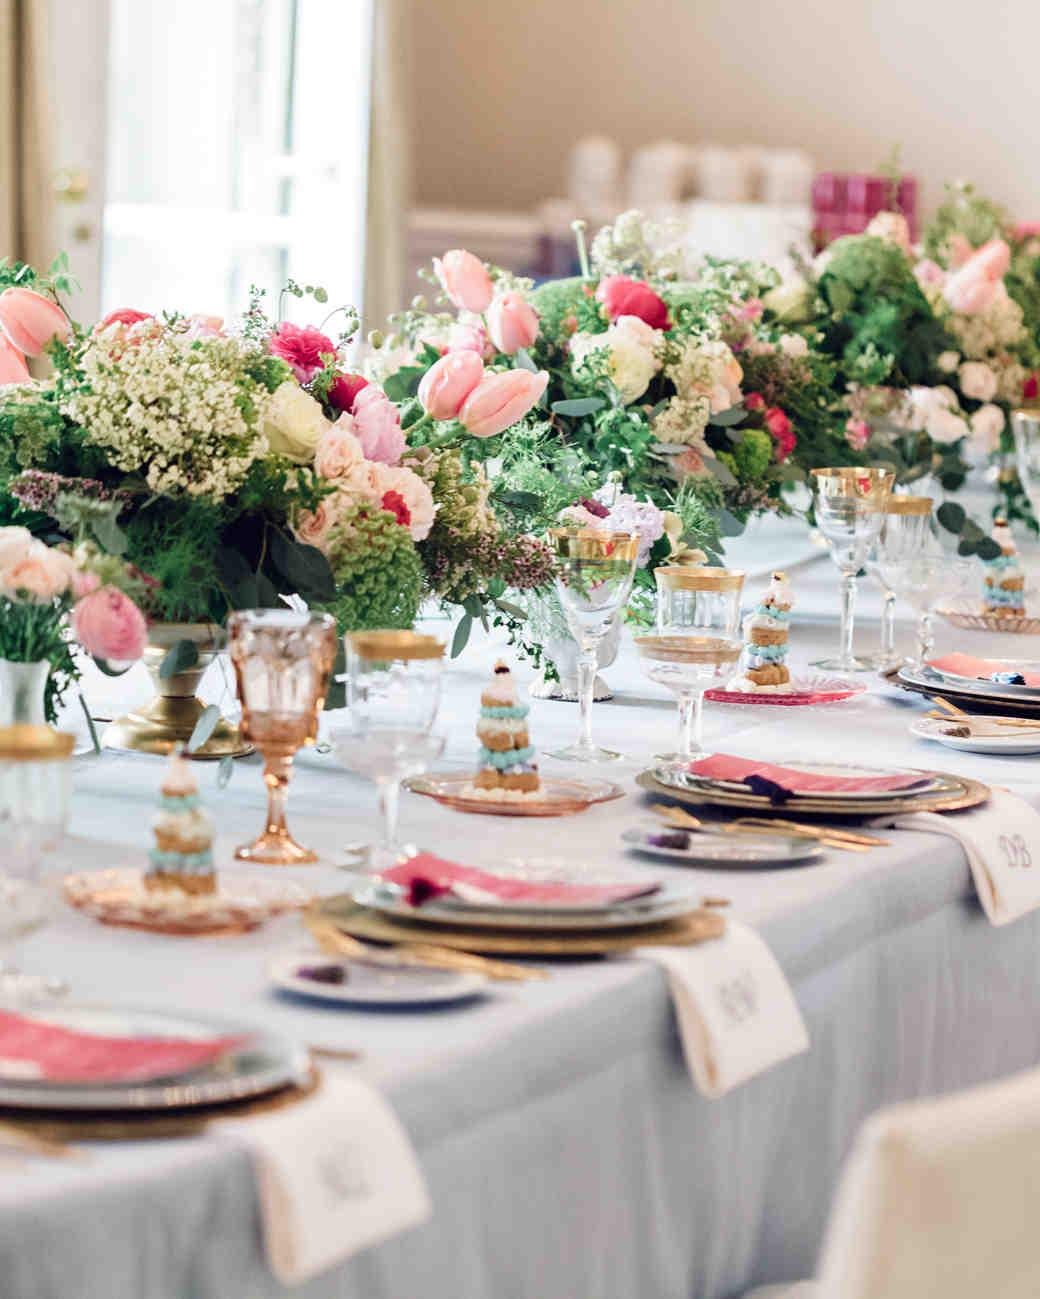 & The Prettiest Bridal Shower Centerpieces | Martha Stewart Weddings